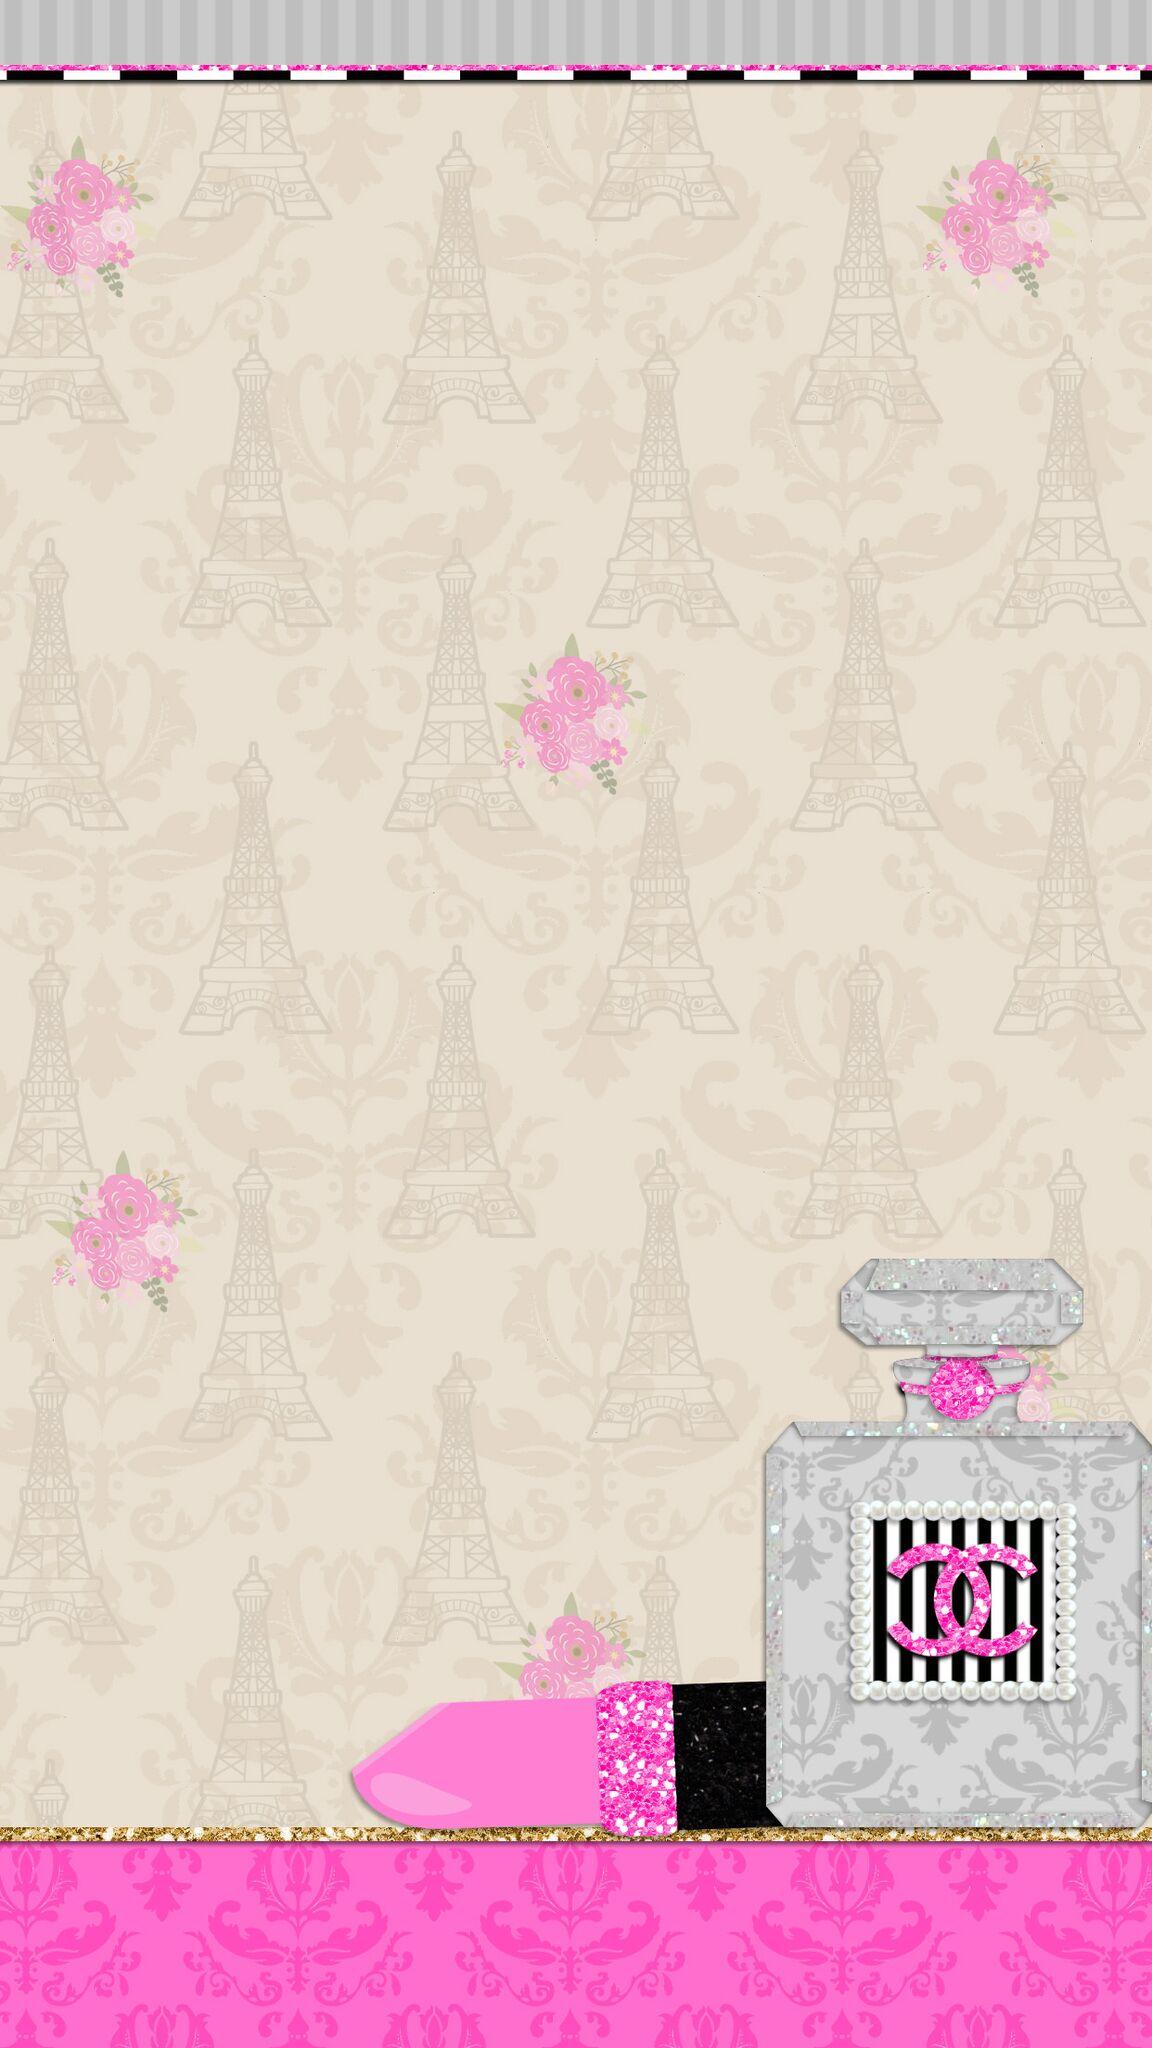 Bonjour-love-Dropbox-wallpaper-wp4804843